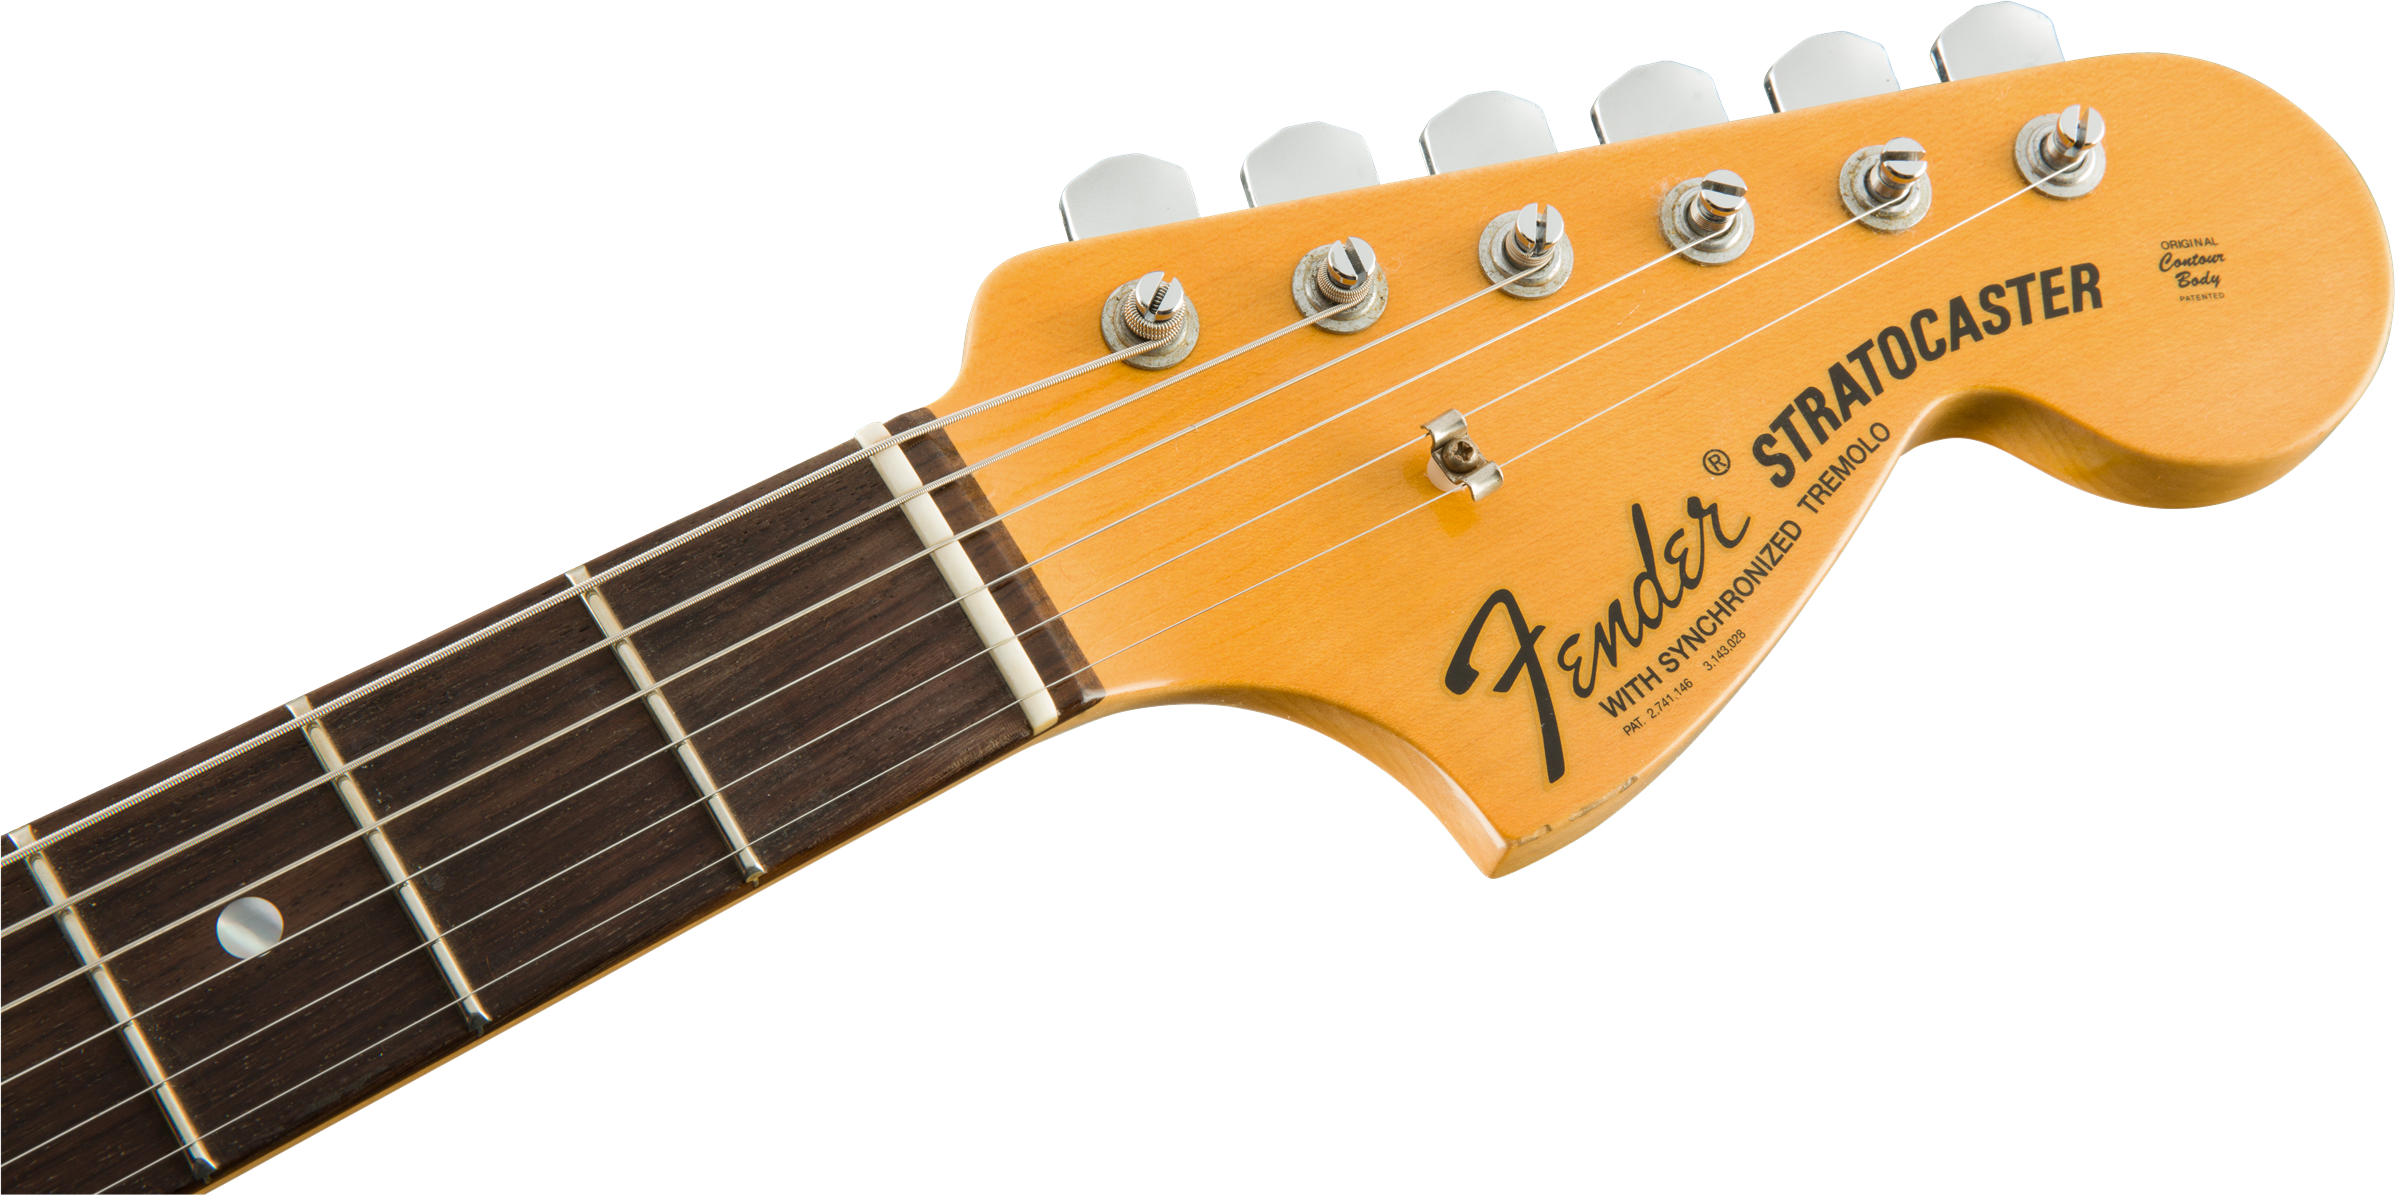 Fender Mid Boost Kit Wiring Diagram Electrical Diagrams Schematics U2022 Schematic 2 Pickups 1 Volume Tone 5 Way Switch